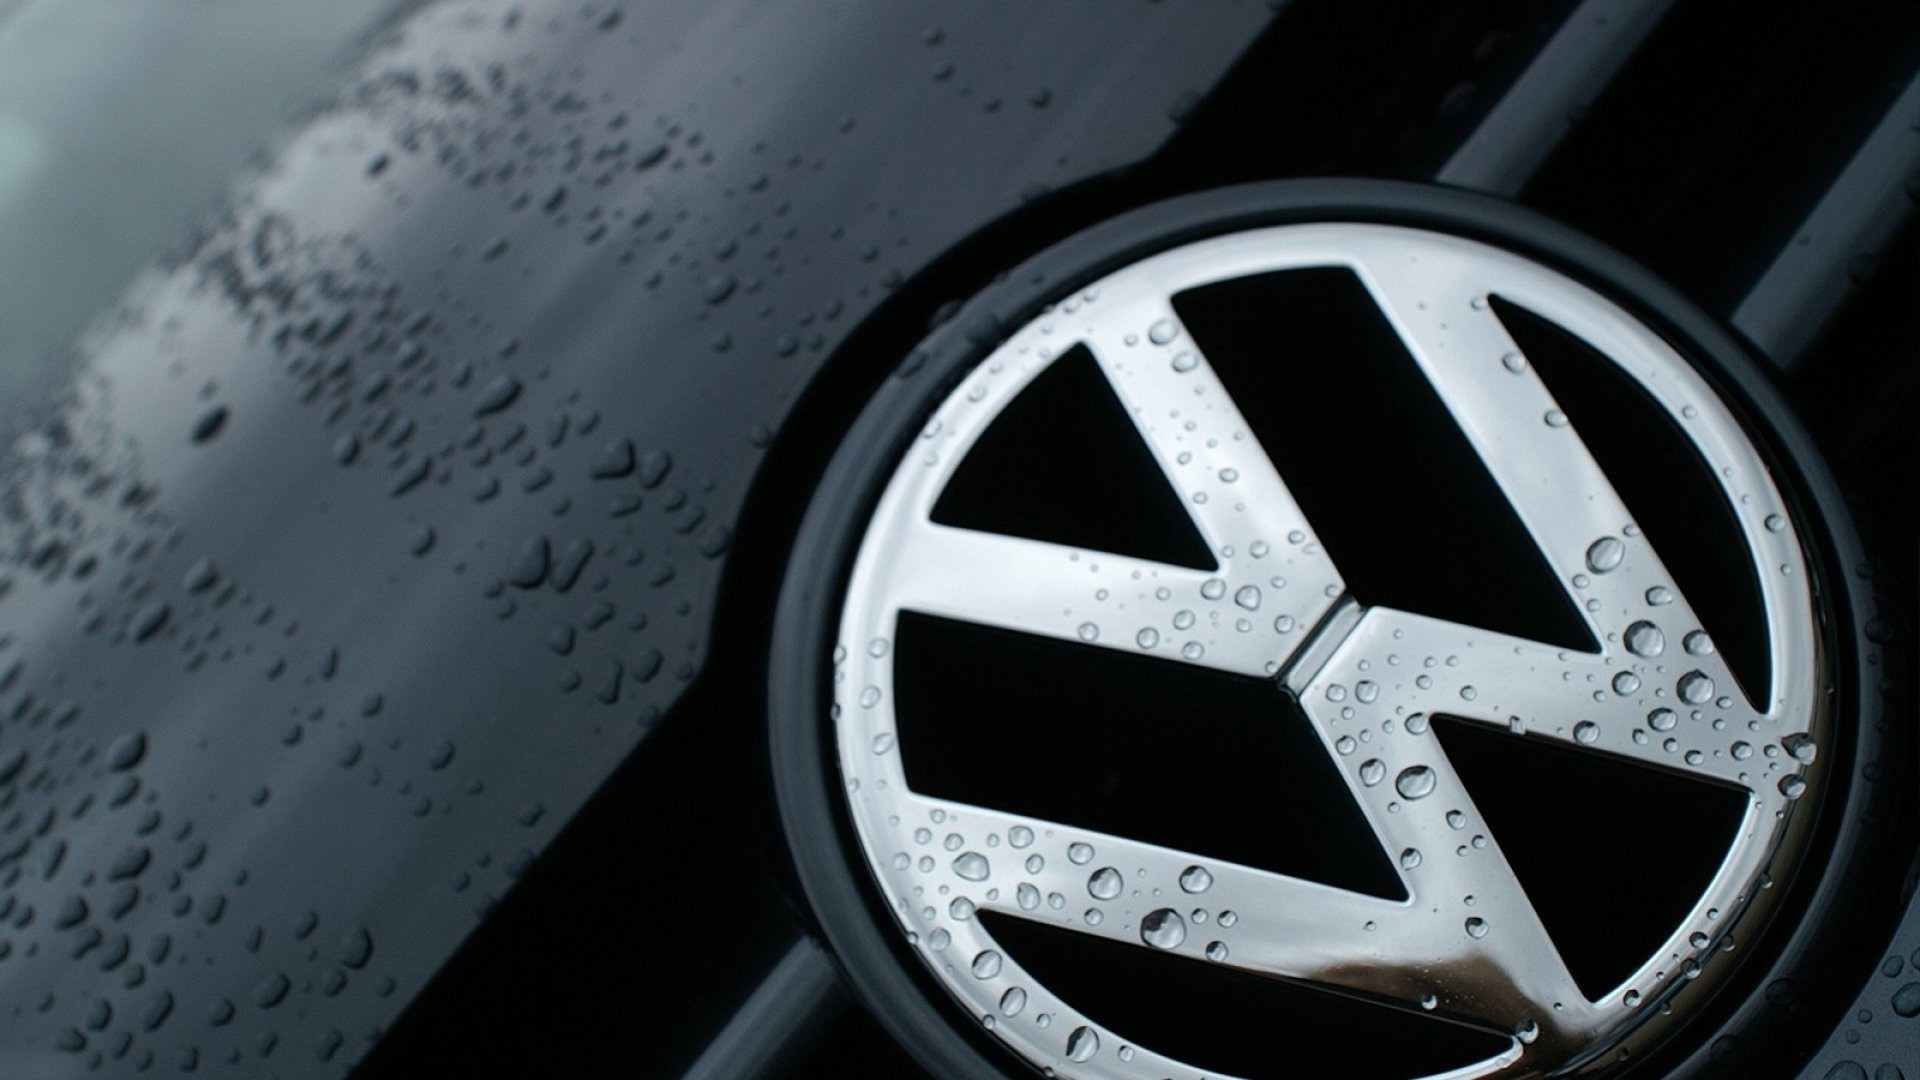 Volkswagen Wallpaper Black Ground Wallpaper Vw Logo Wallpaper